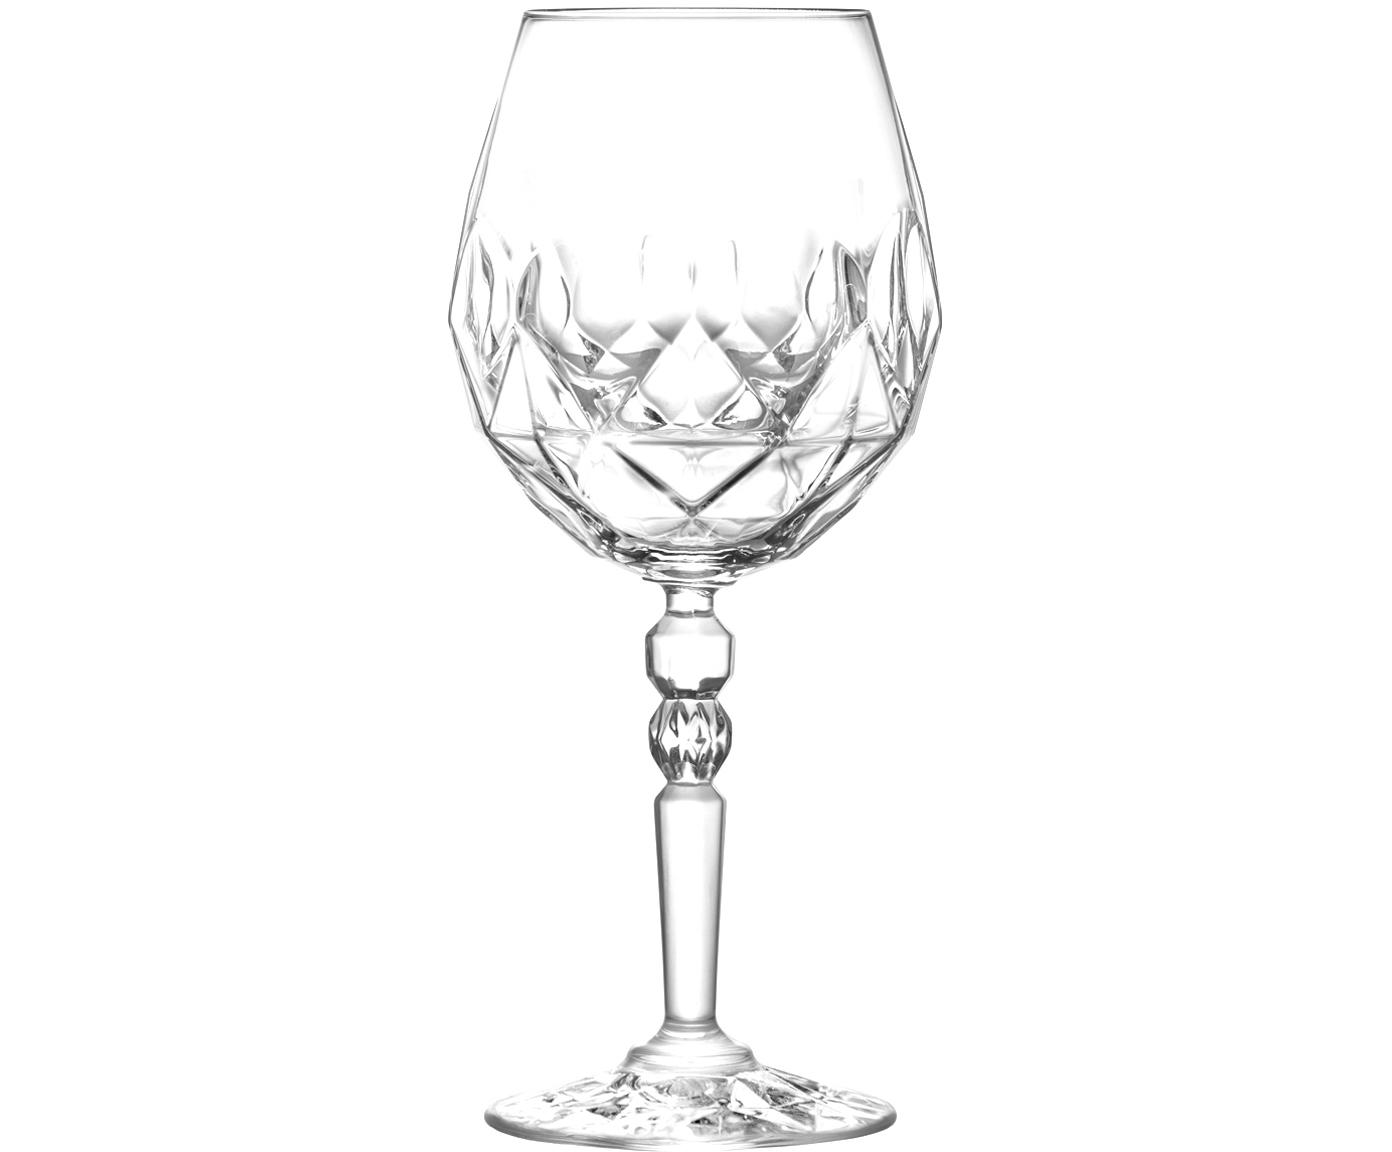 Kristallen rode wijnglazen Calicia, 6 stuks, Kristalglas, Transparant, Ø 10 x H 23 cm